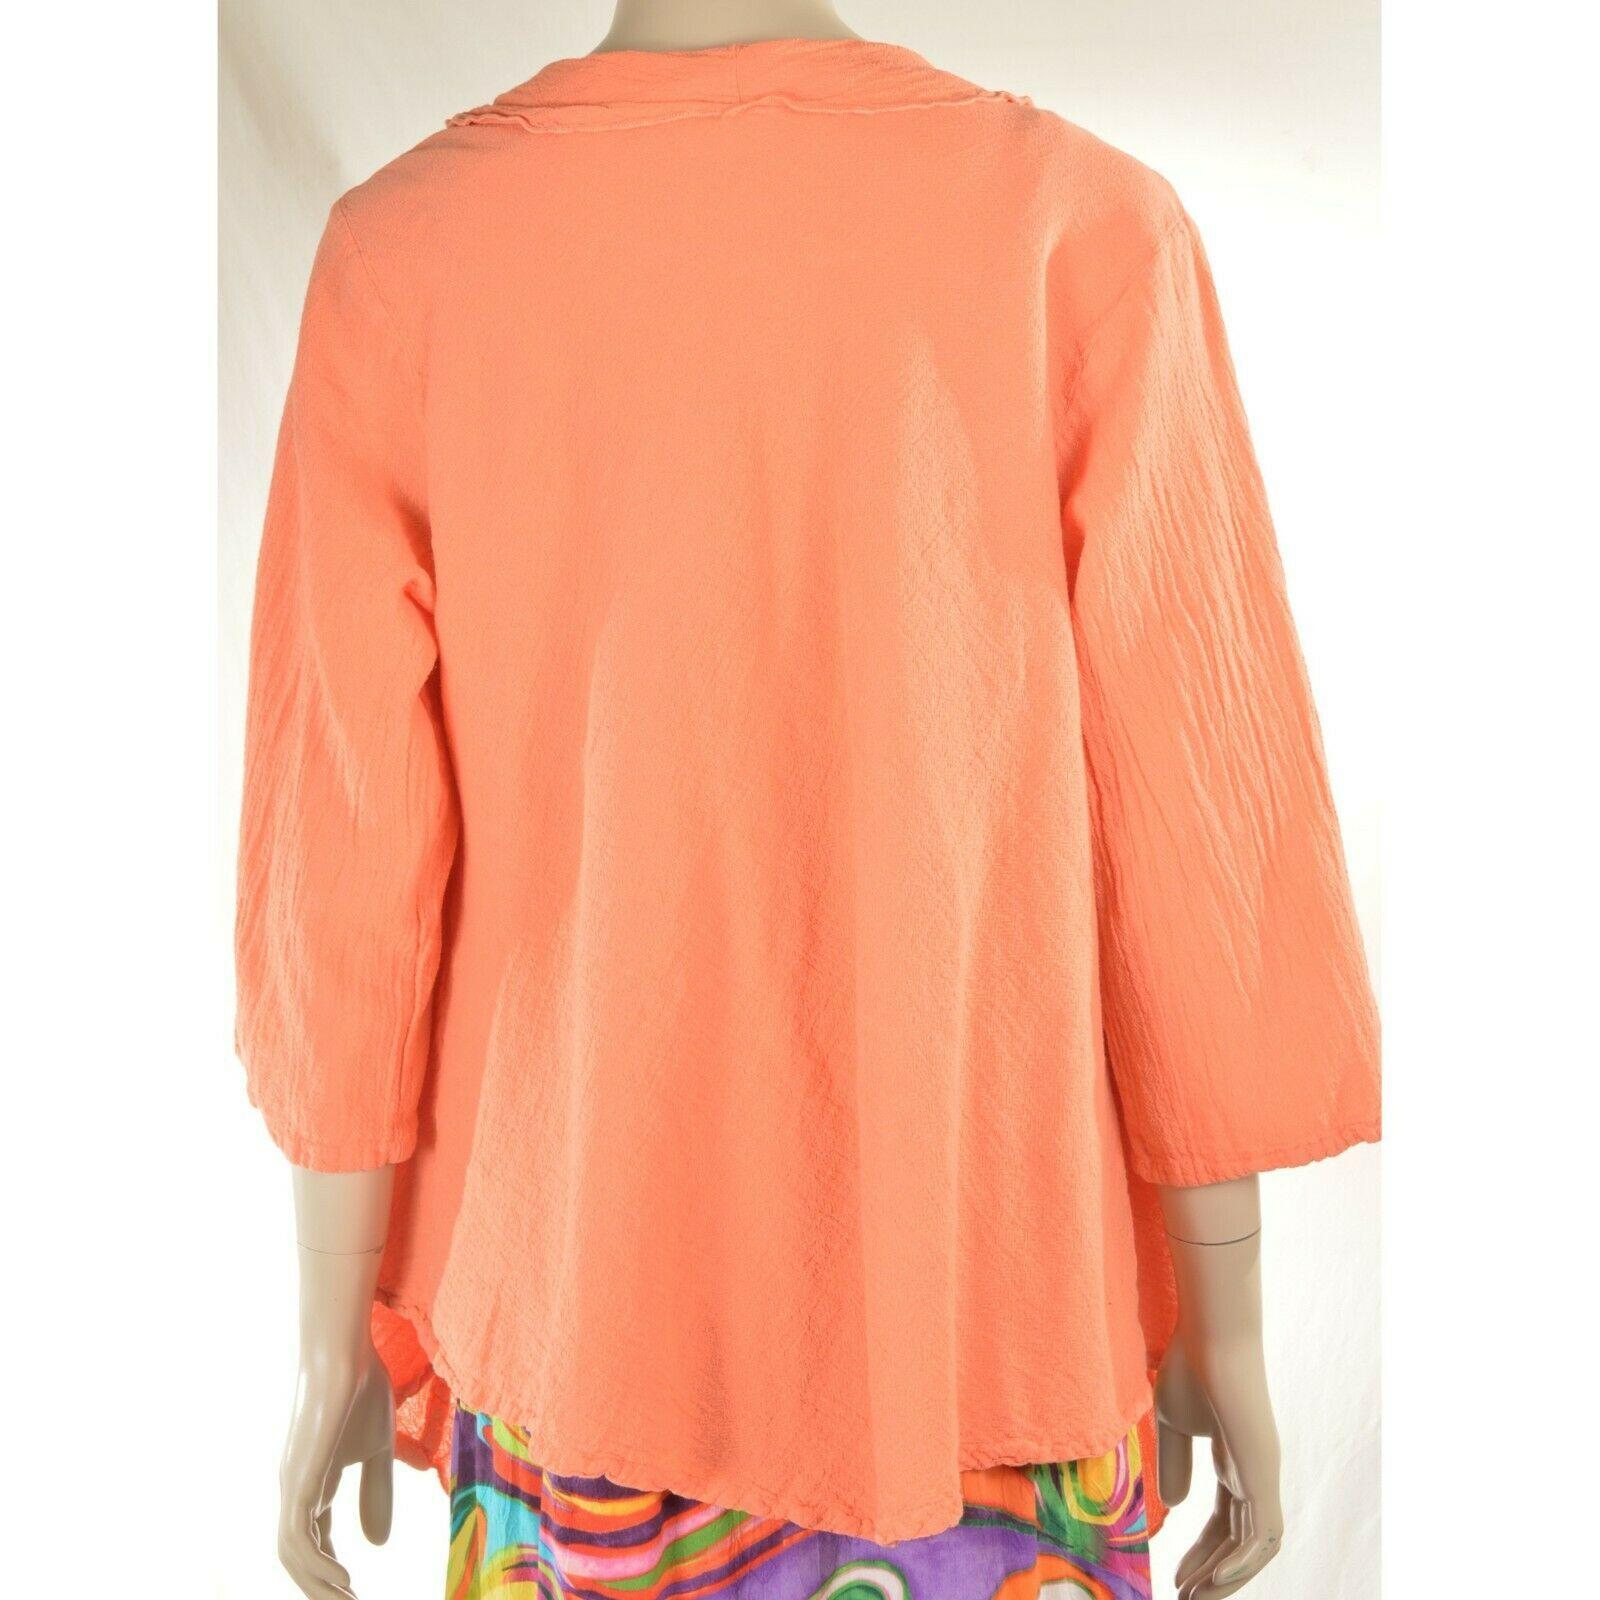 Oh My Gauge jacket cover open OS orange sherbet long sleeve ruffle front hi lo image 3